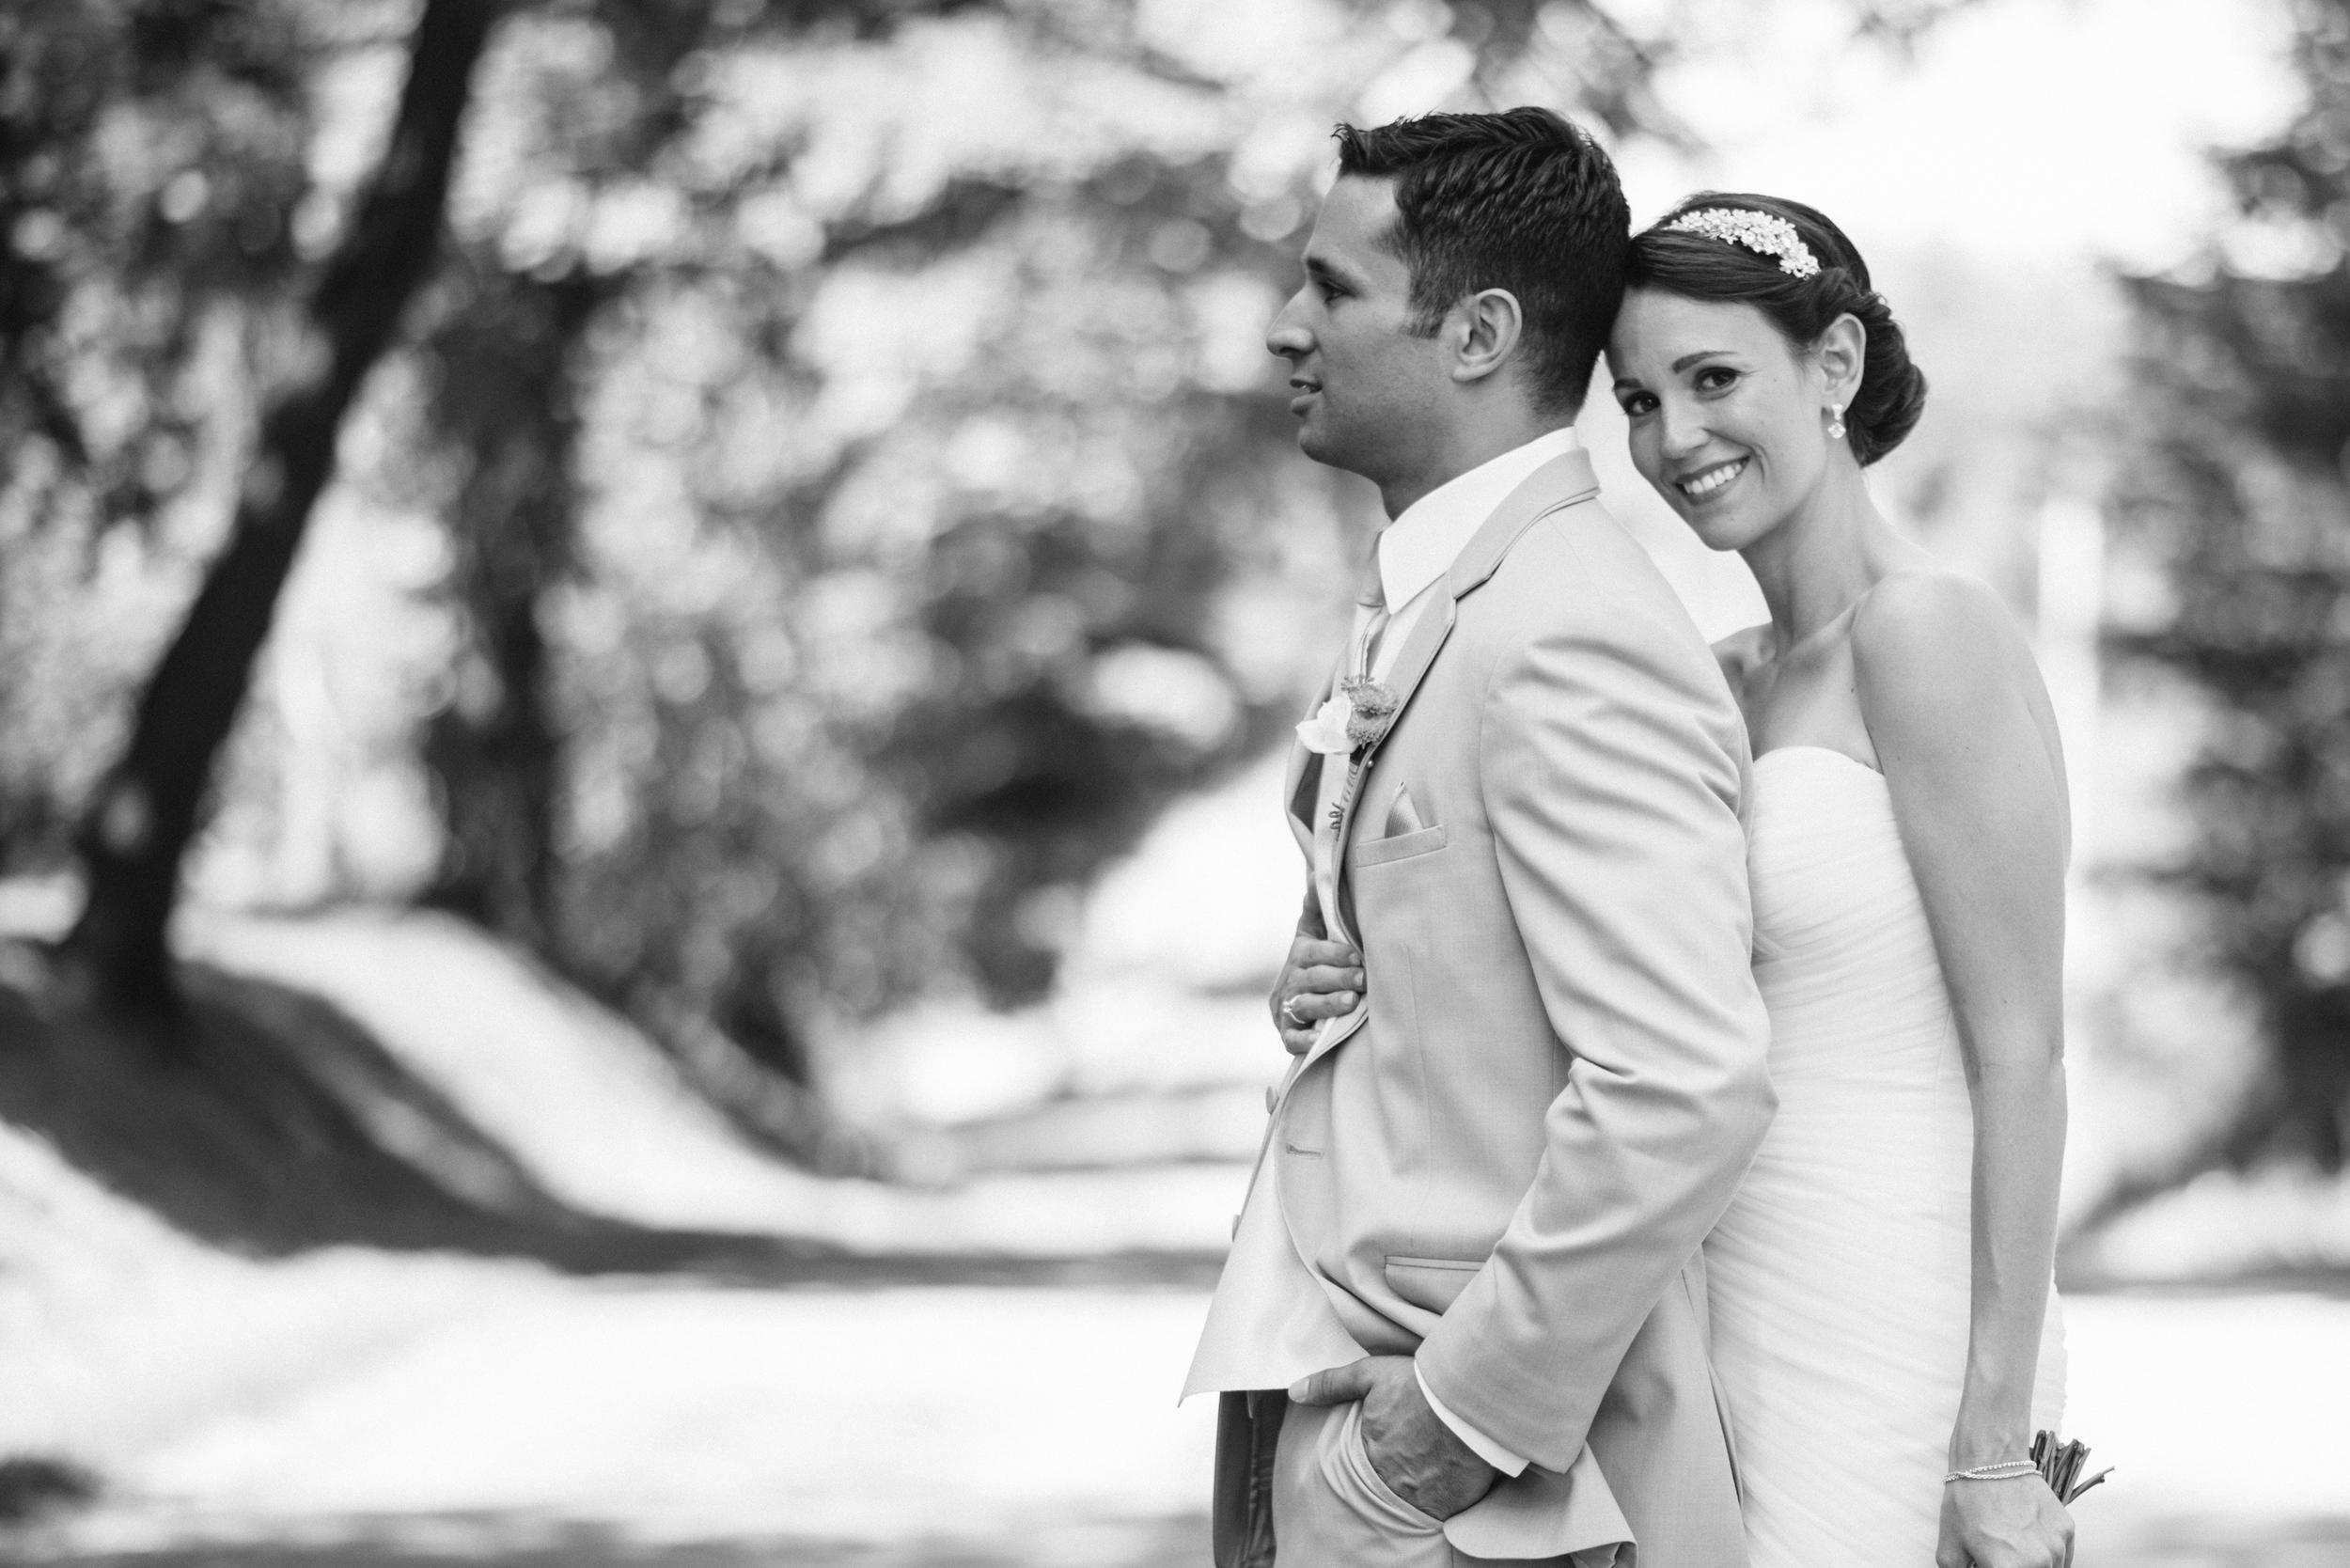 Matt_Swetel_Photography_Erin_and_Jeff_married028.jpg